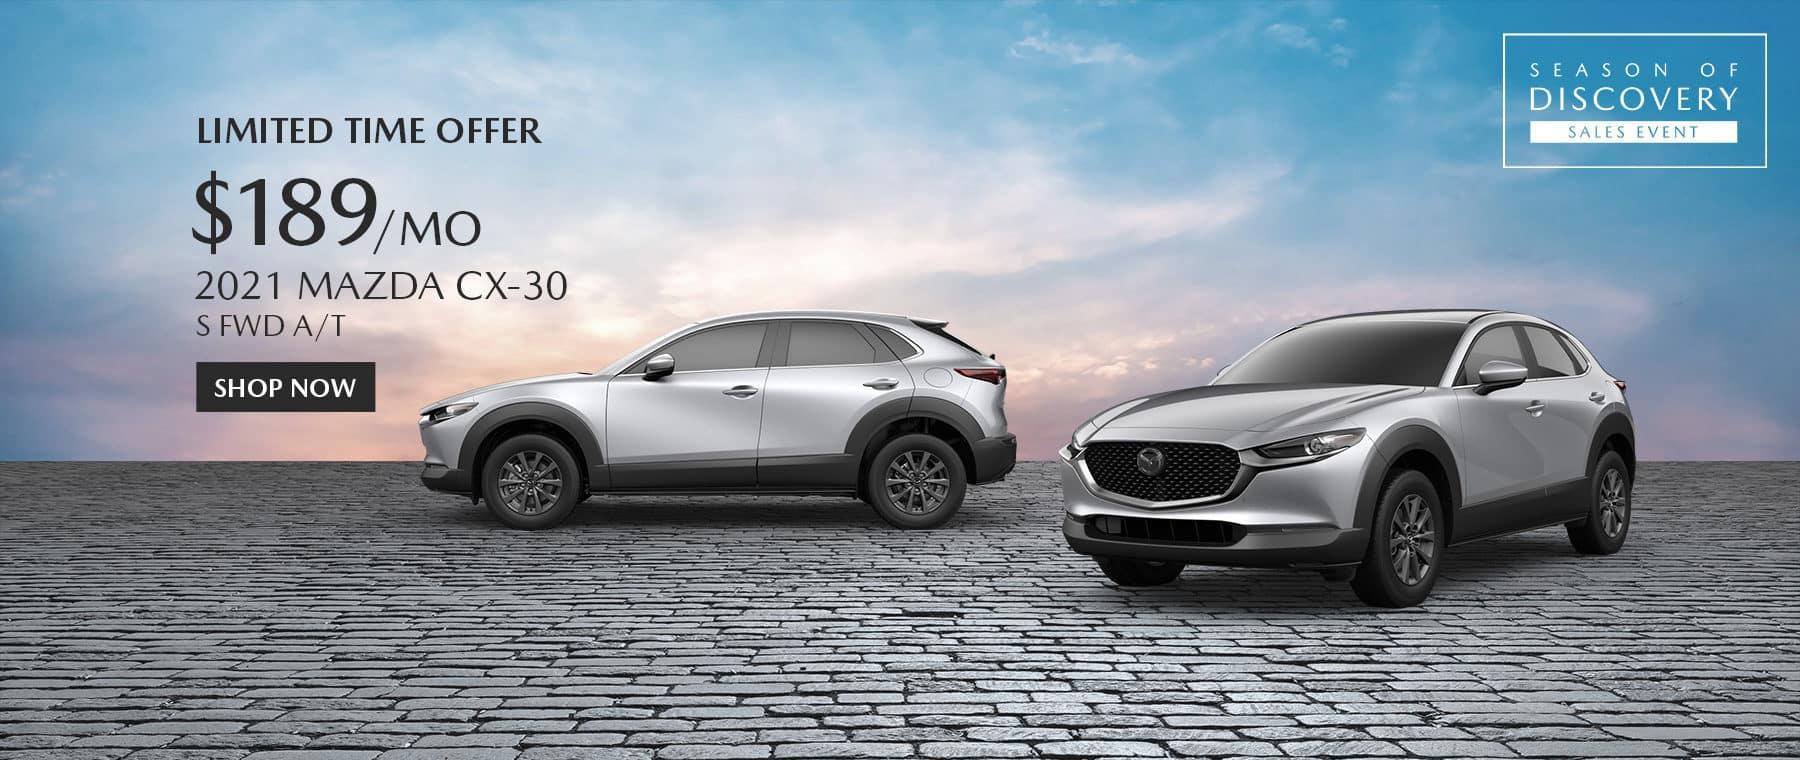 2021 Mazda CX30 Special